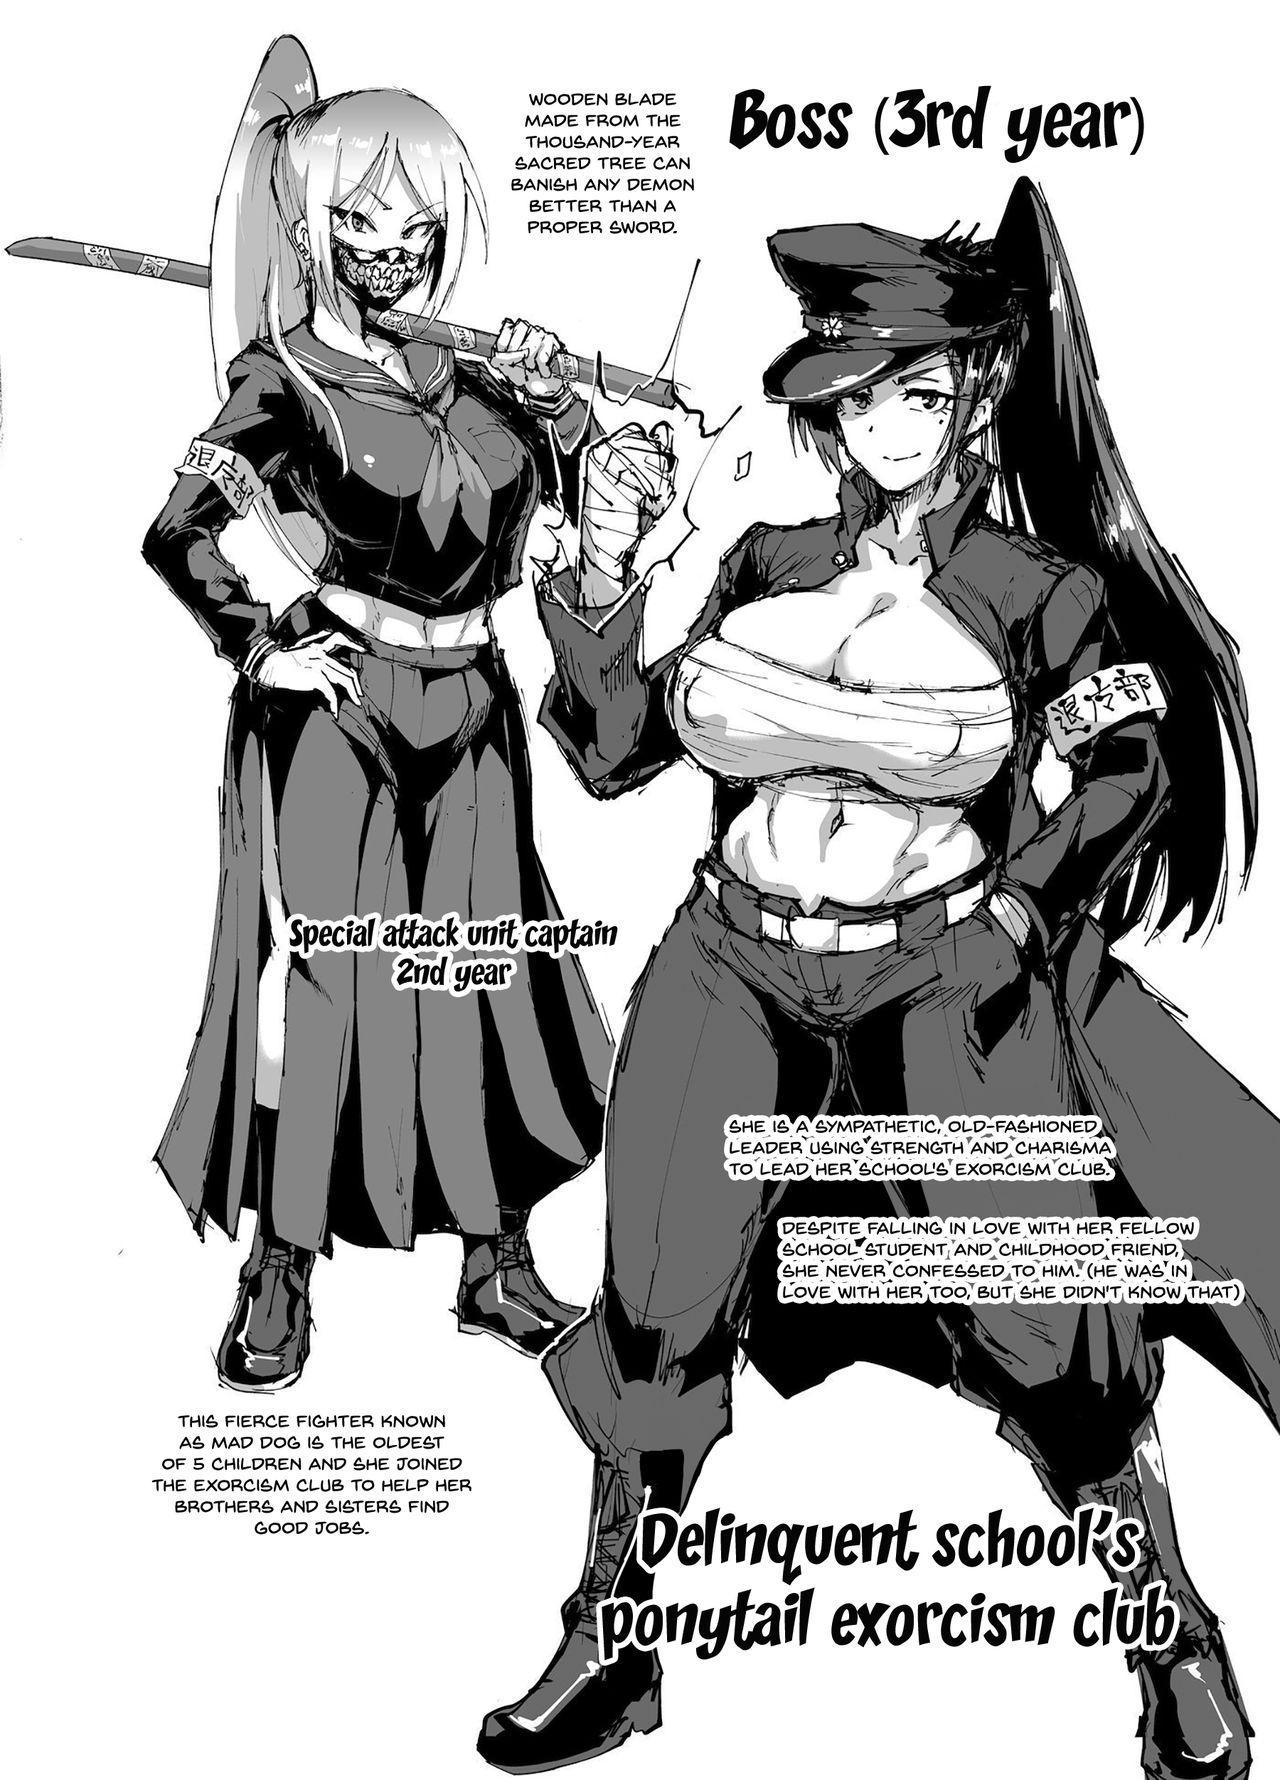 Kurokami Ponytail Tsurime JK Taimabu Rakugaki | Exorcism Club for Black Haired Girls with Ponytails 11